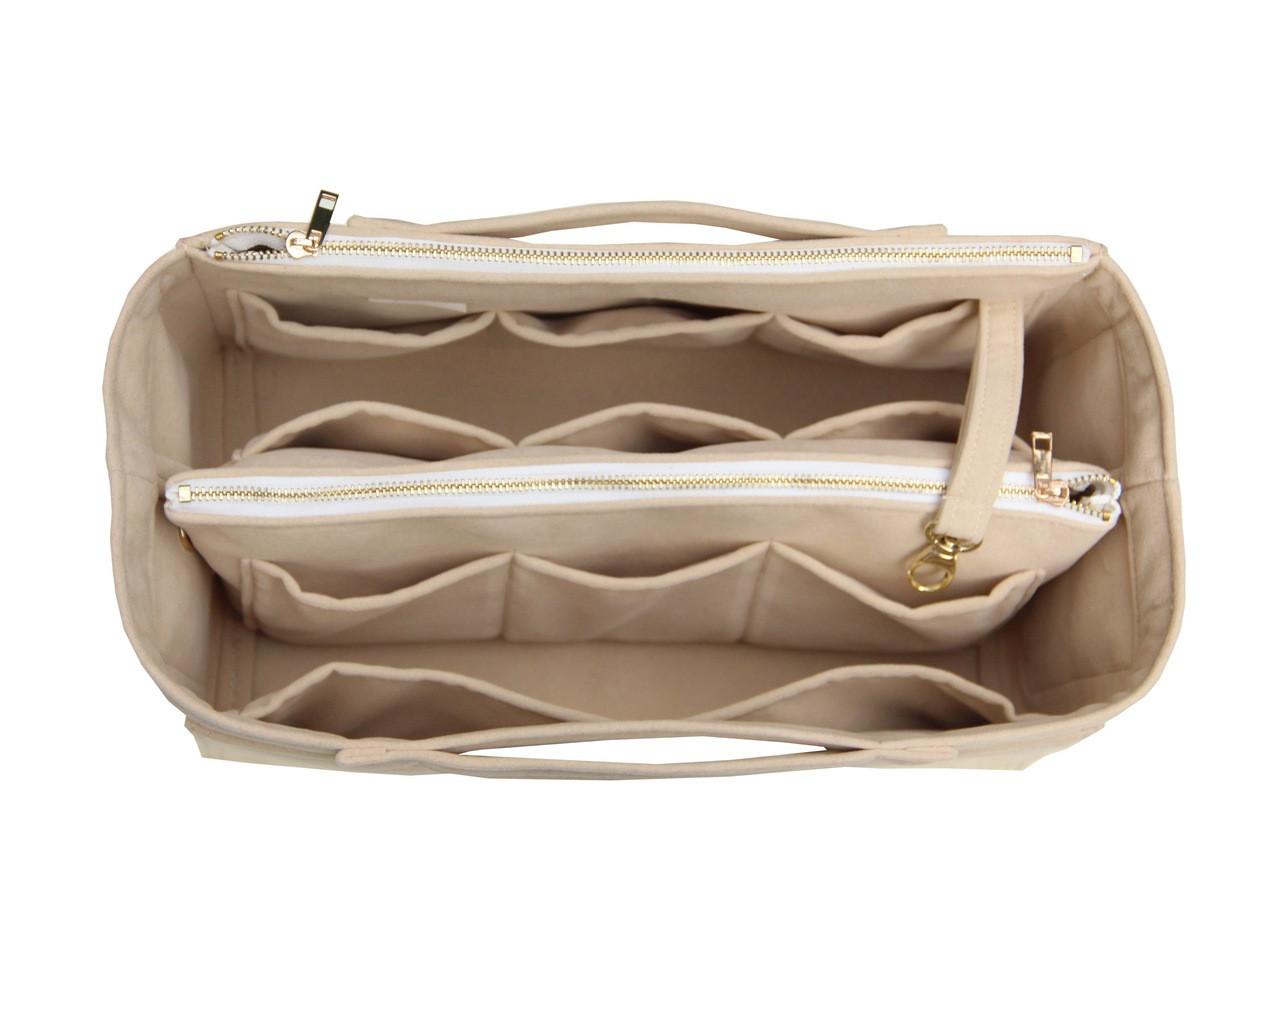 58211bae217 Customizable Velvet Tote Bag Organizer